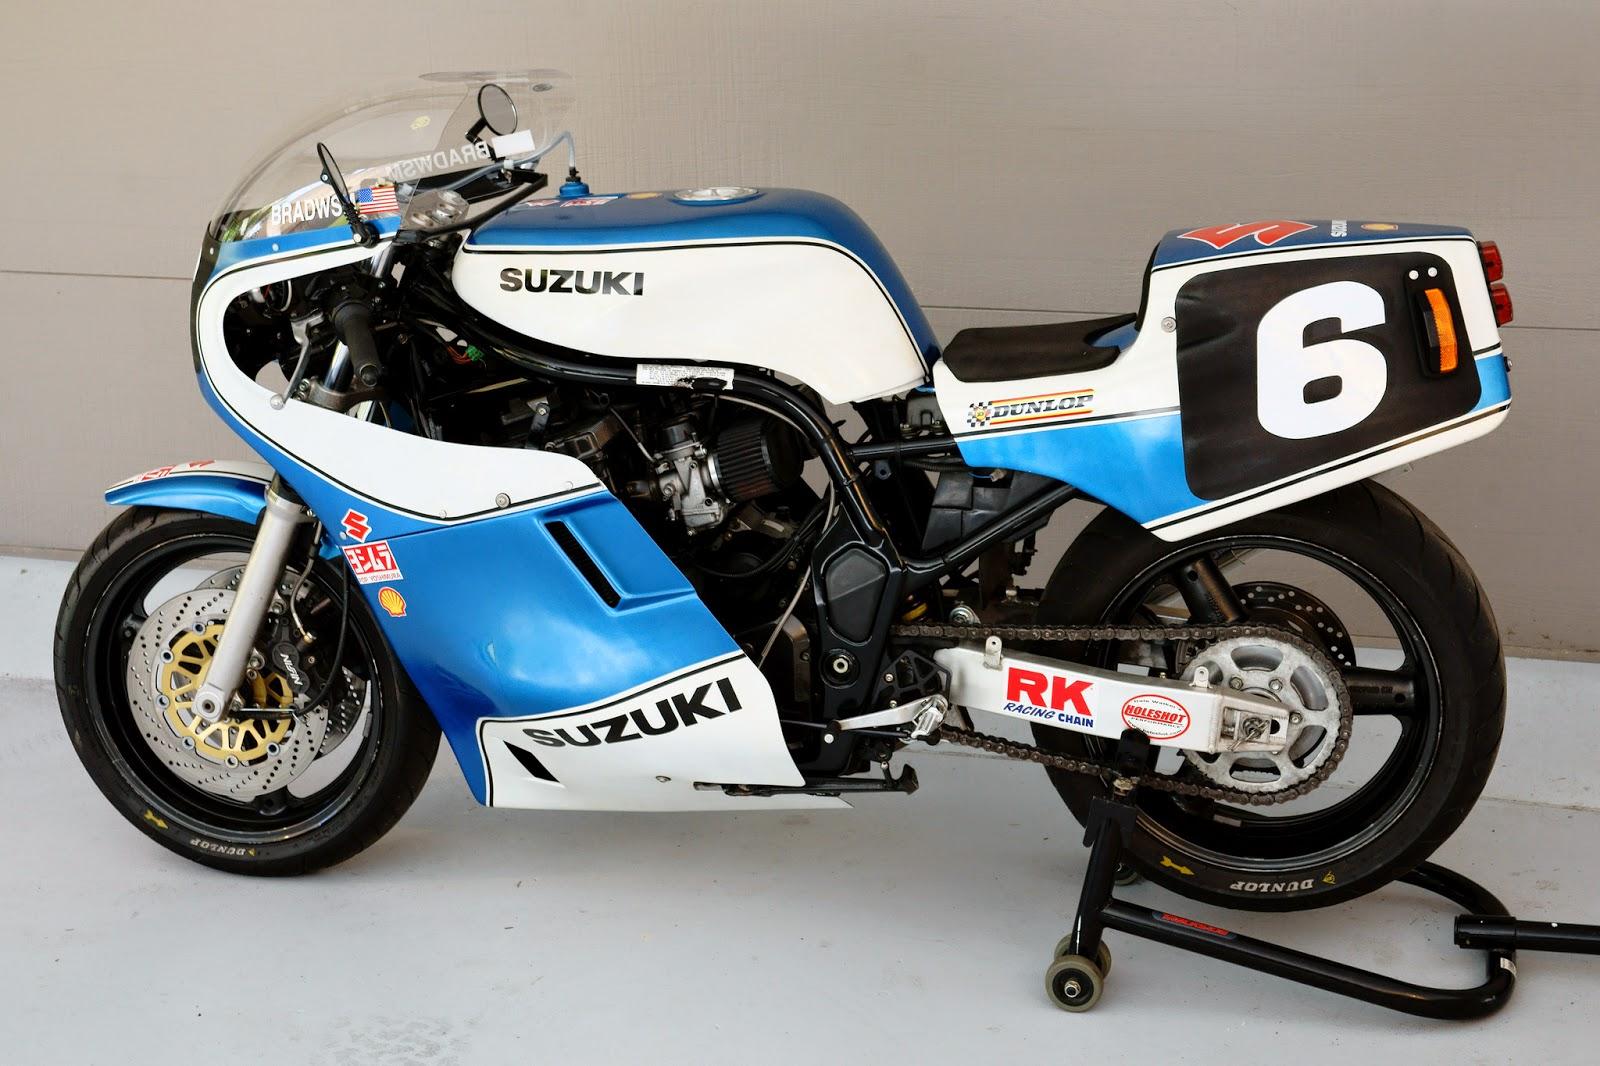 Bmw Gs 650 >> Suzuki Bandit GSF 1200 Tribute GS1000R Endurance | 99garage | Cafe Racers Customs Passion ...